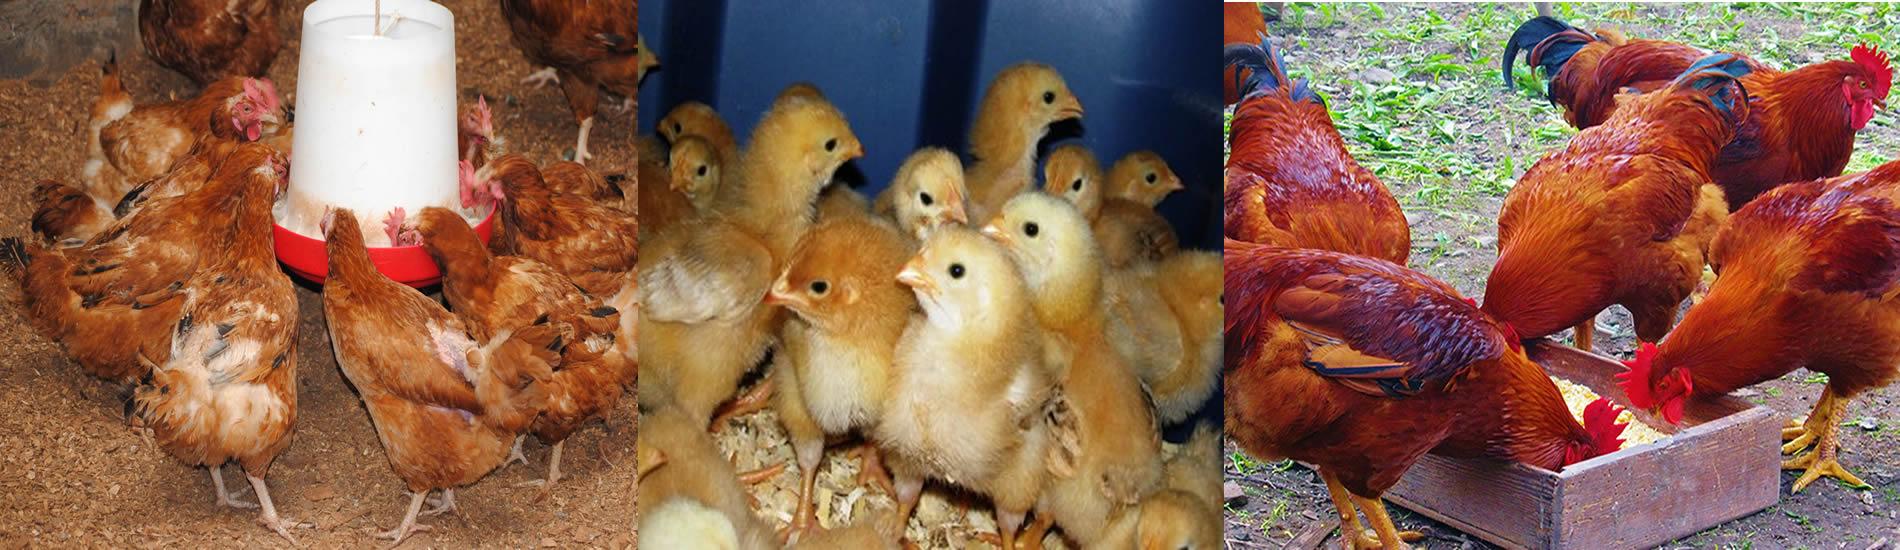 kenbro chicks - Ziwani Poultry